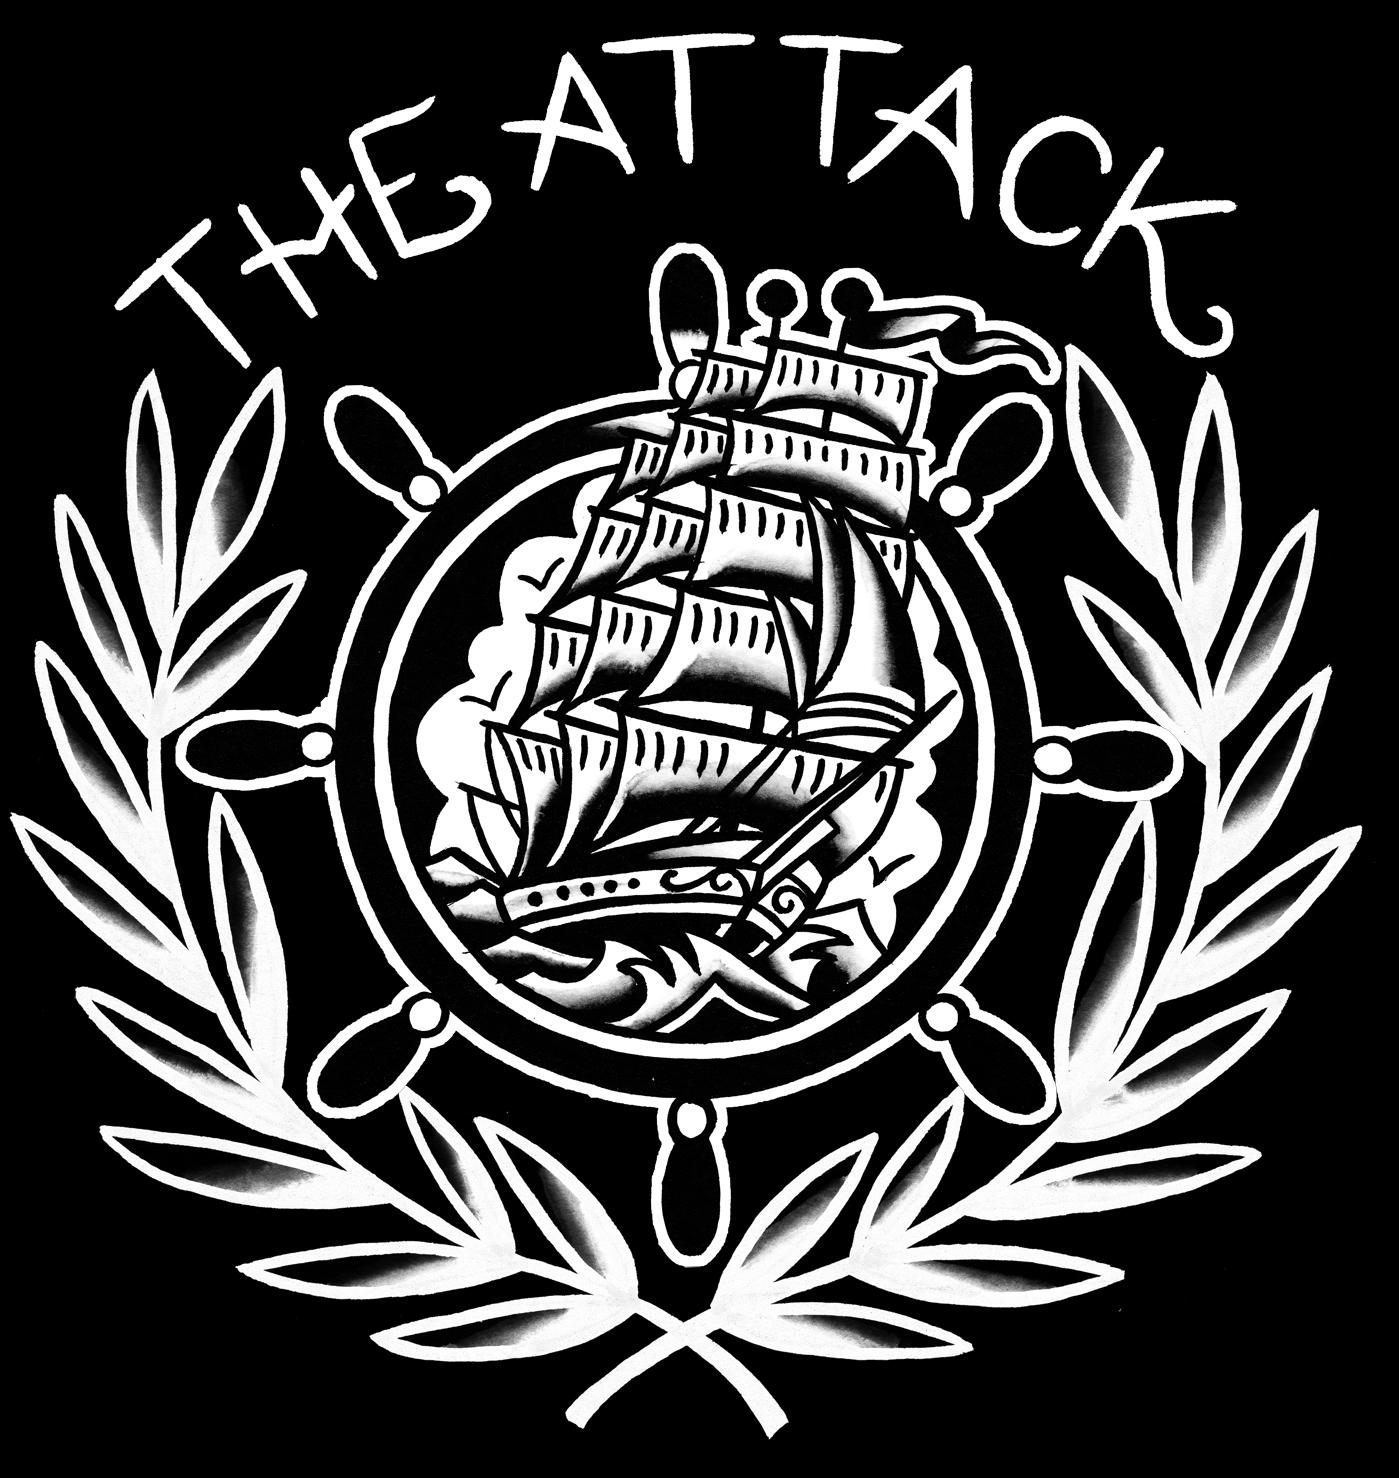 The Attack cut anchor_Ship